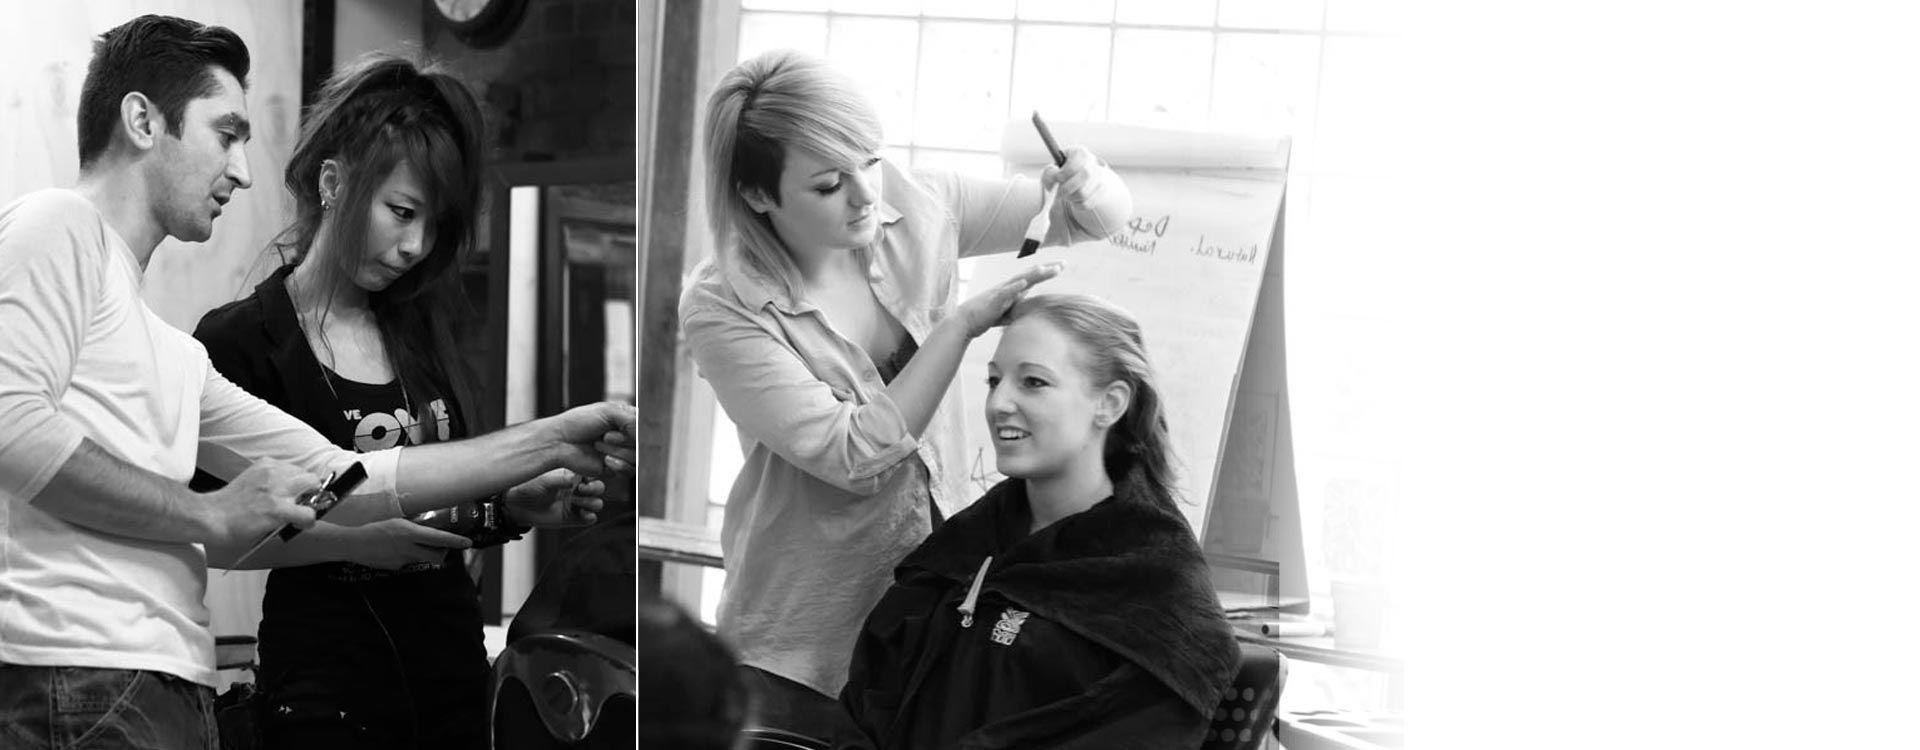 Best Hairdressing Academy Schools Hair Academy Melbourne Hair Academy Hairstyles For School Hairdresser